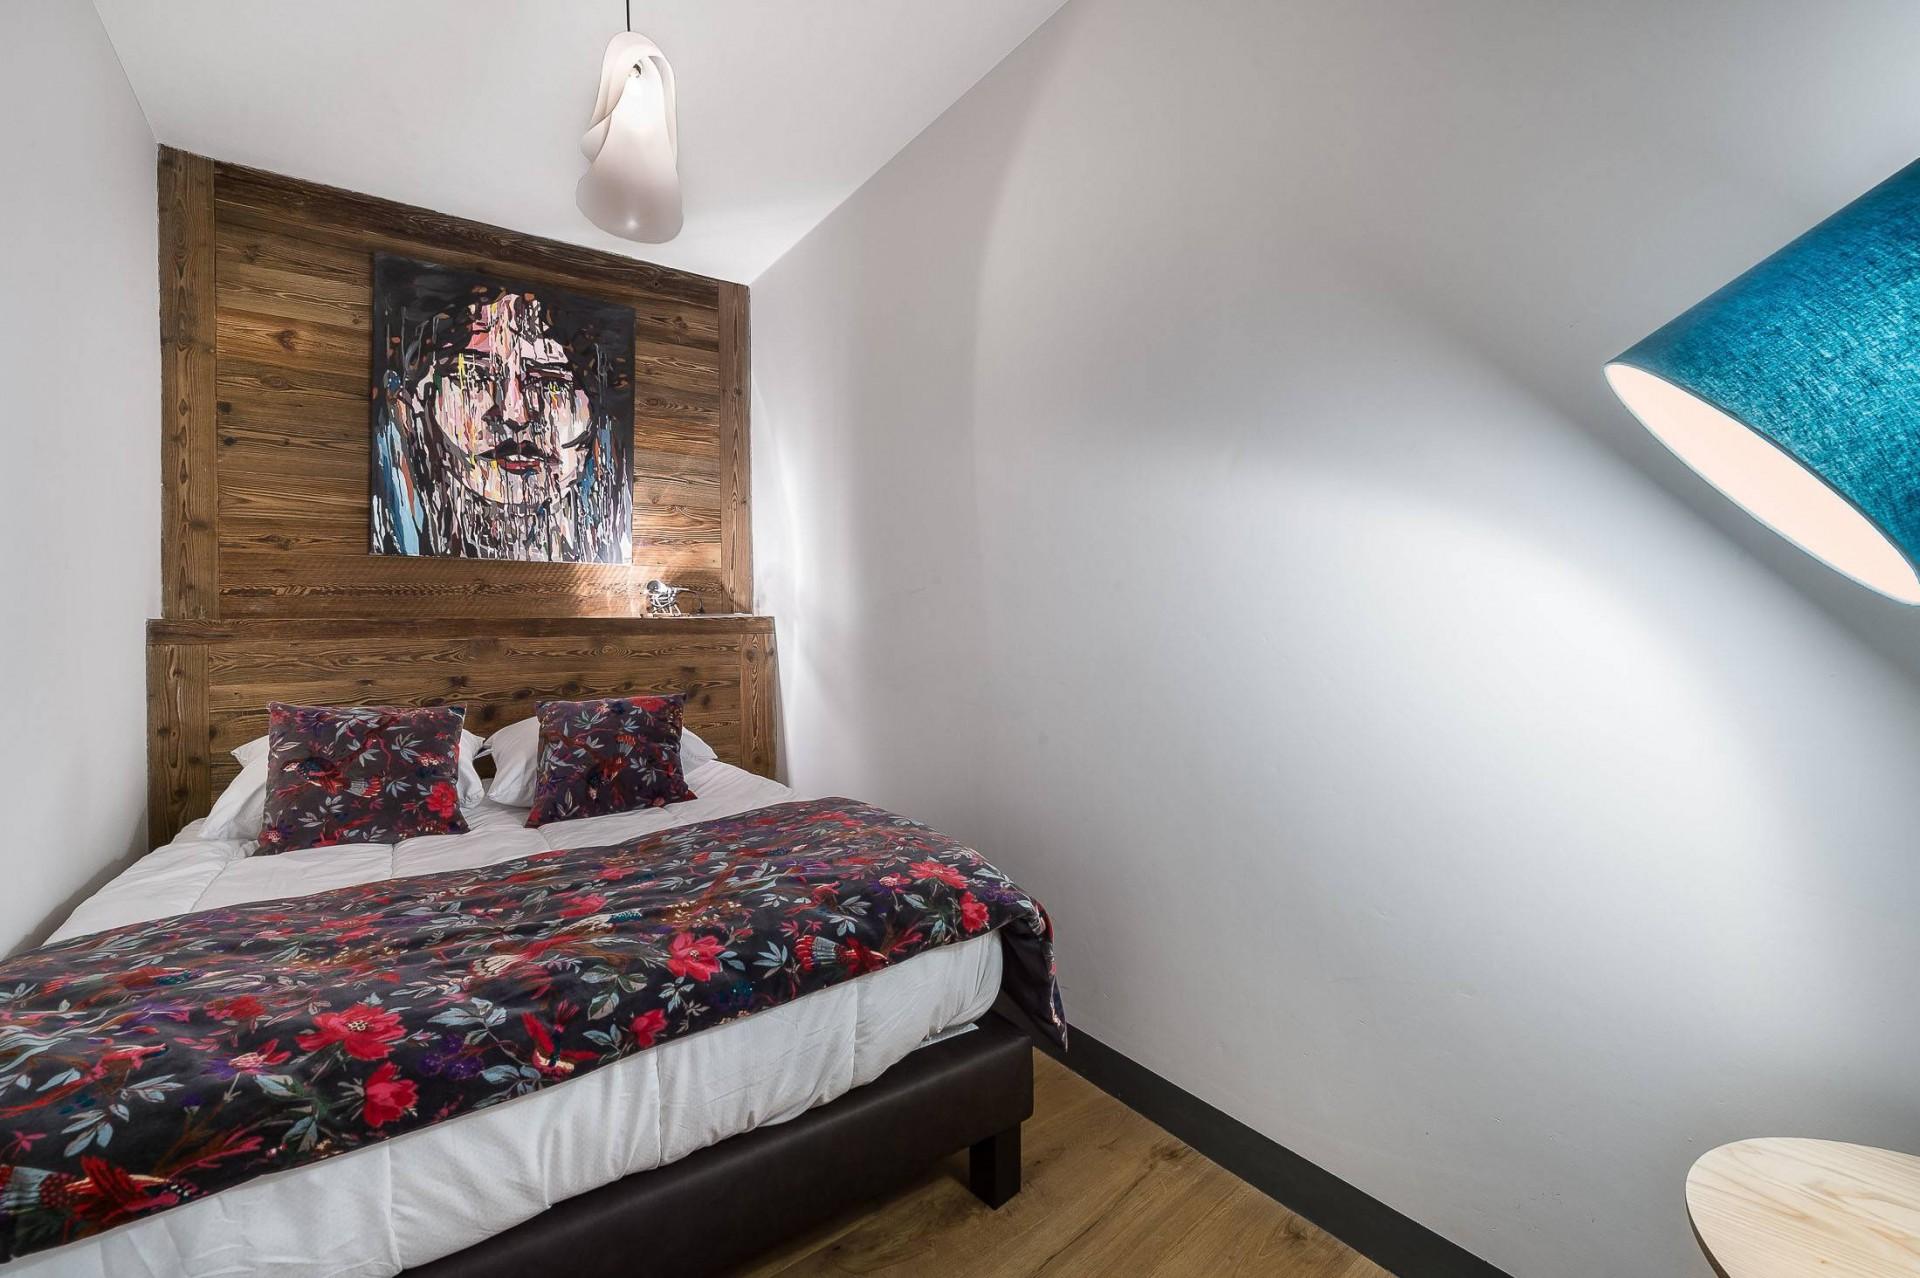 Val d'Isère Location Appartement Luxe Ucelite Chambre 2